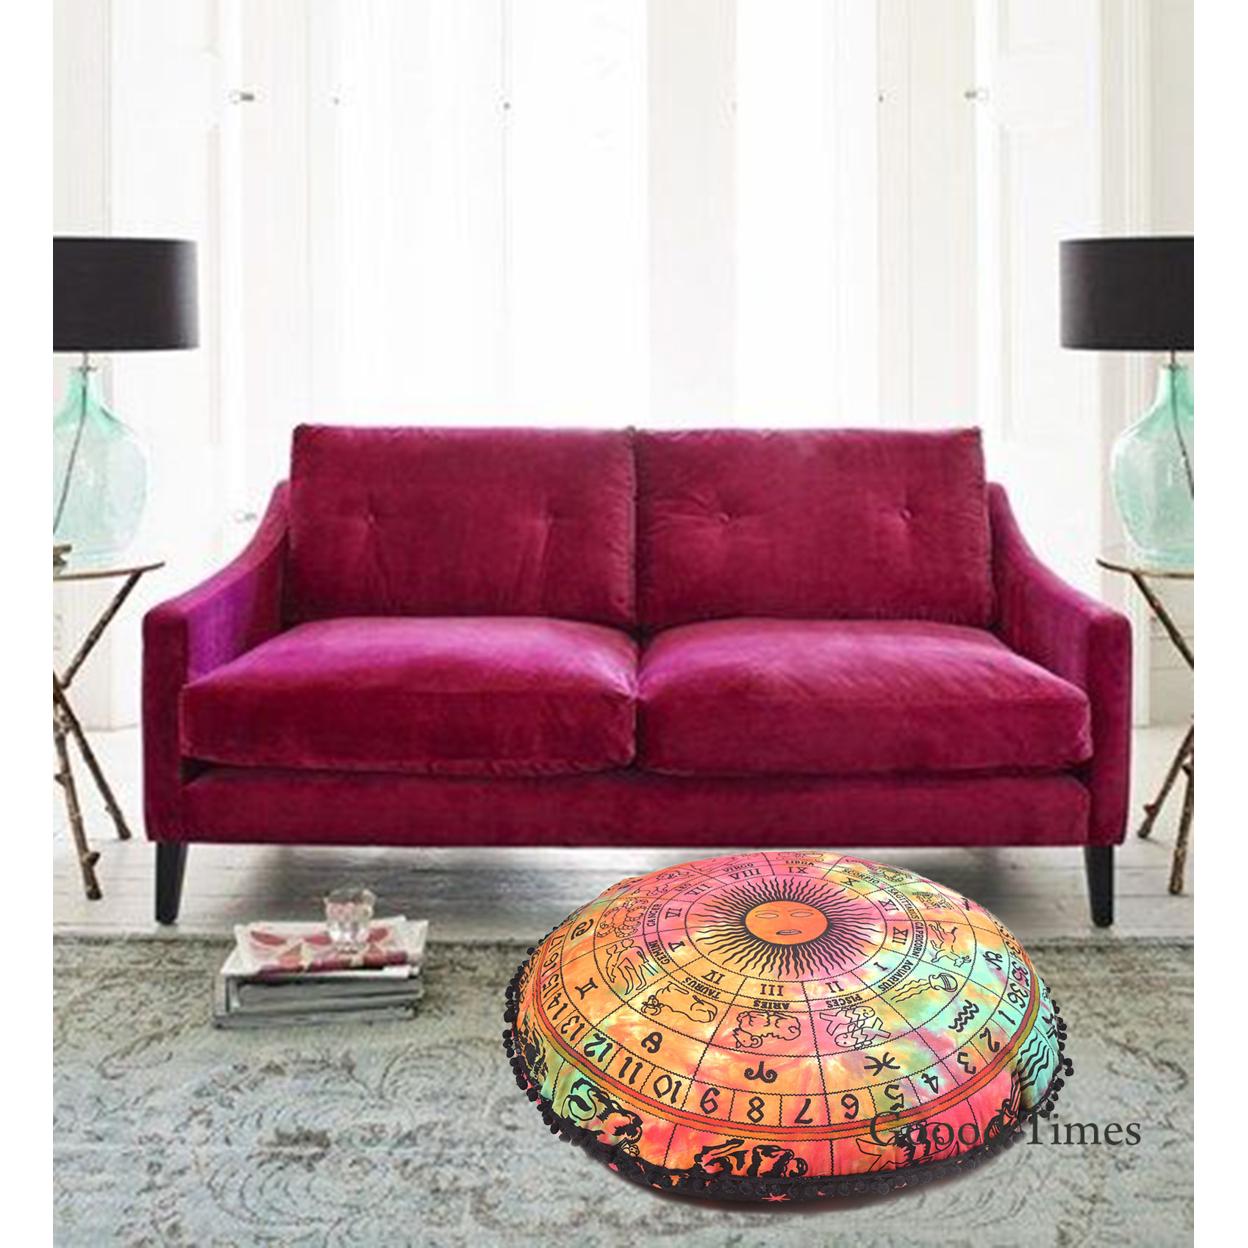 "100% Cotton 32"" Round Zodiac Floor Pillow Cover"